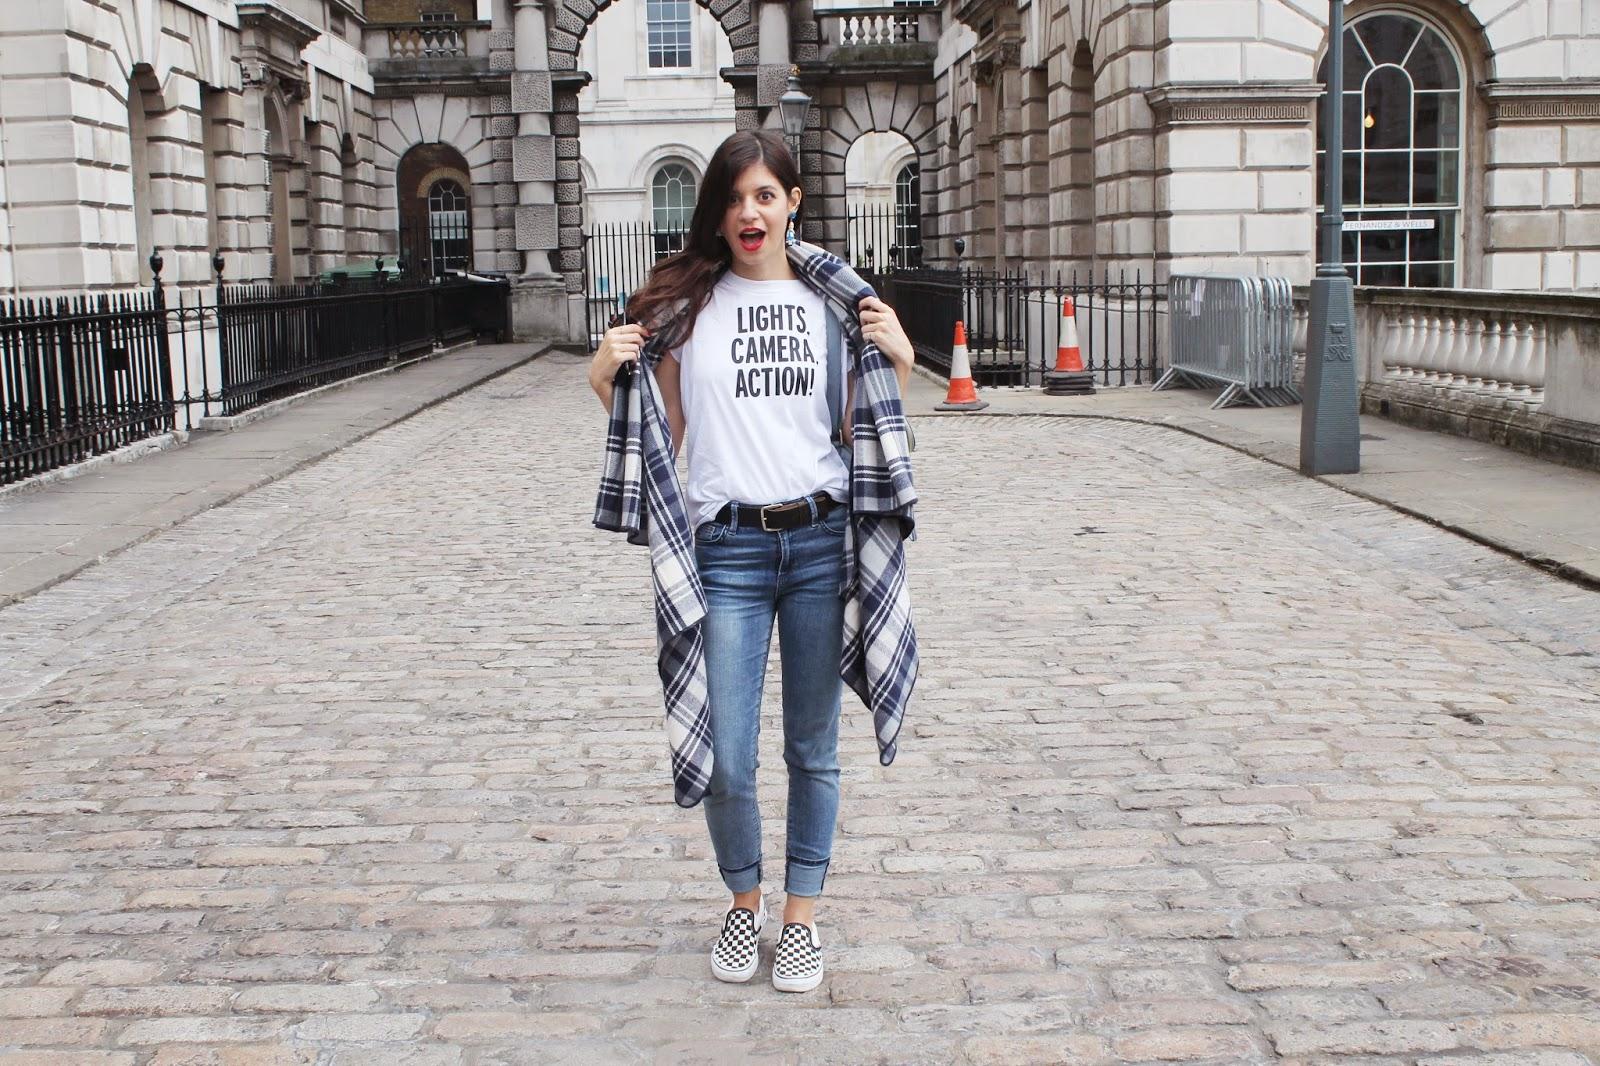 street style, london fashion week, LFW, somerset house, blogger, london, accessorize leather, kate spade